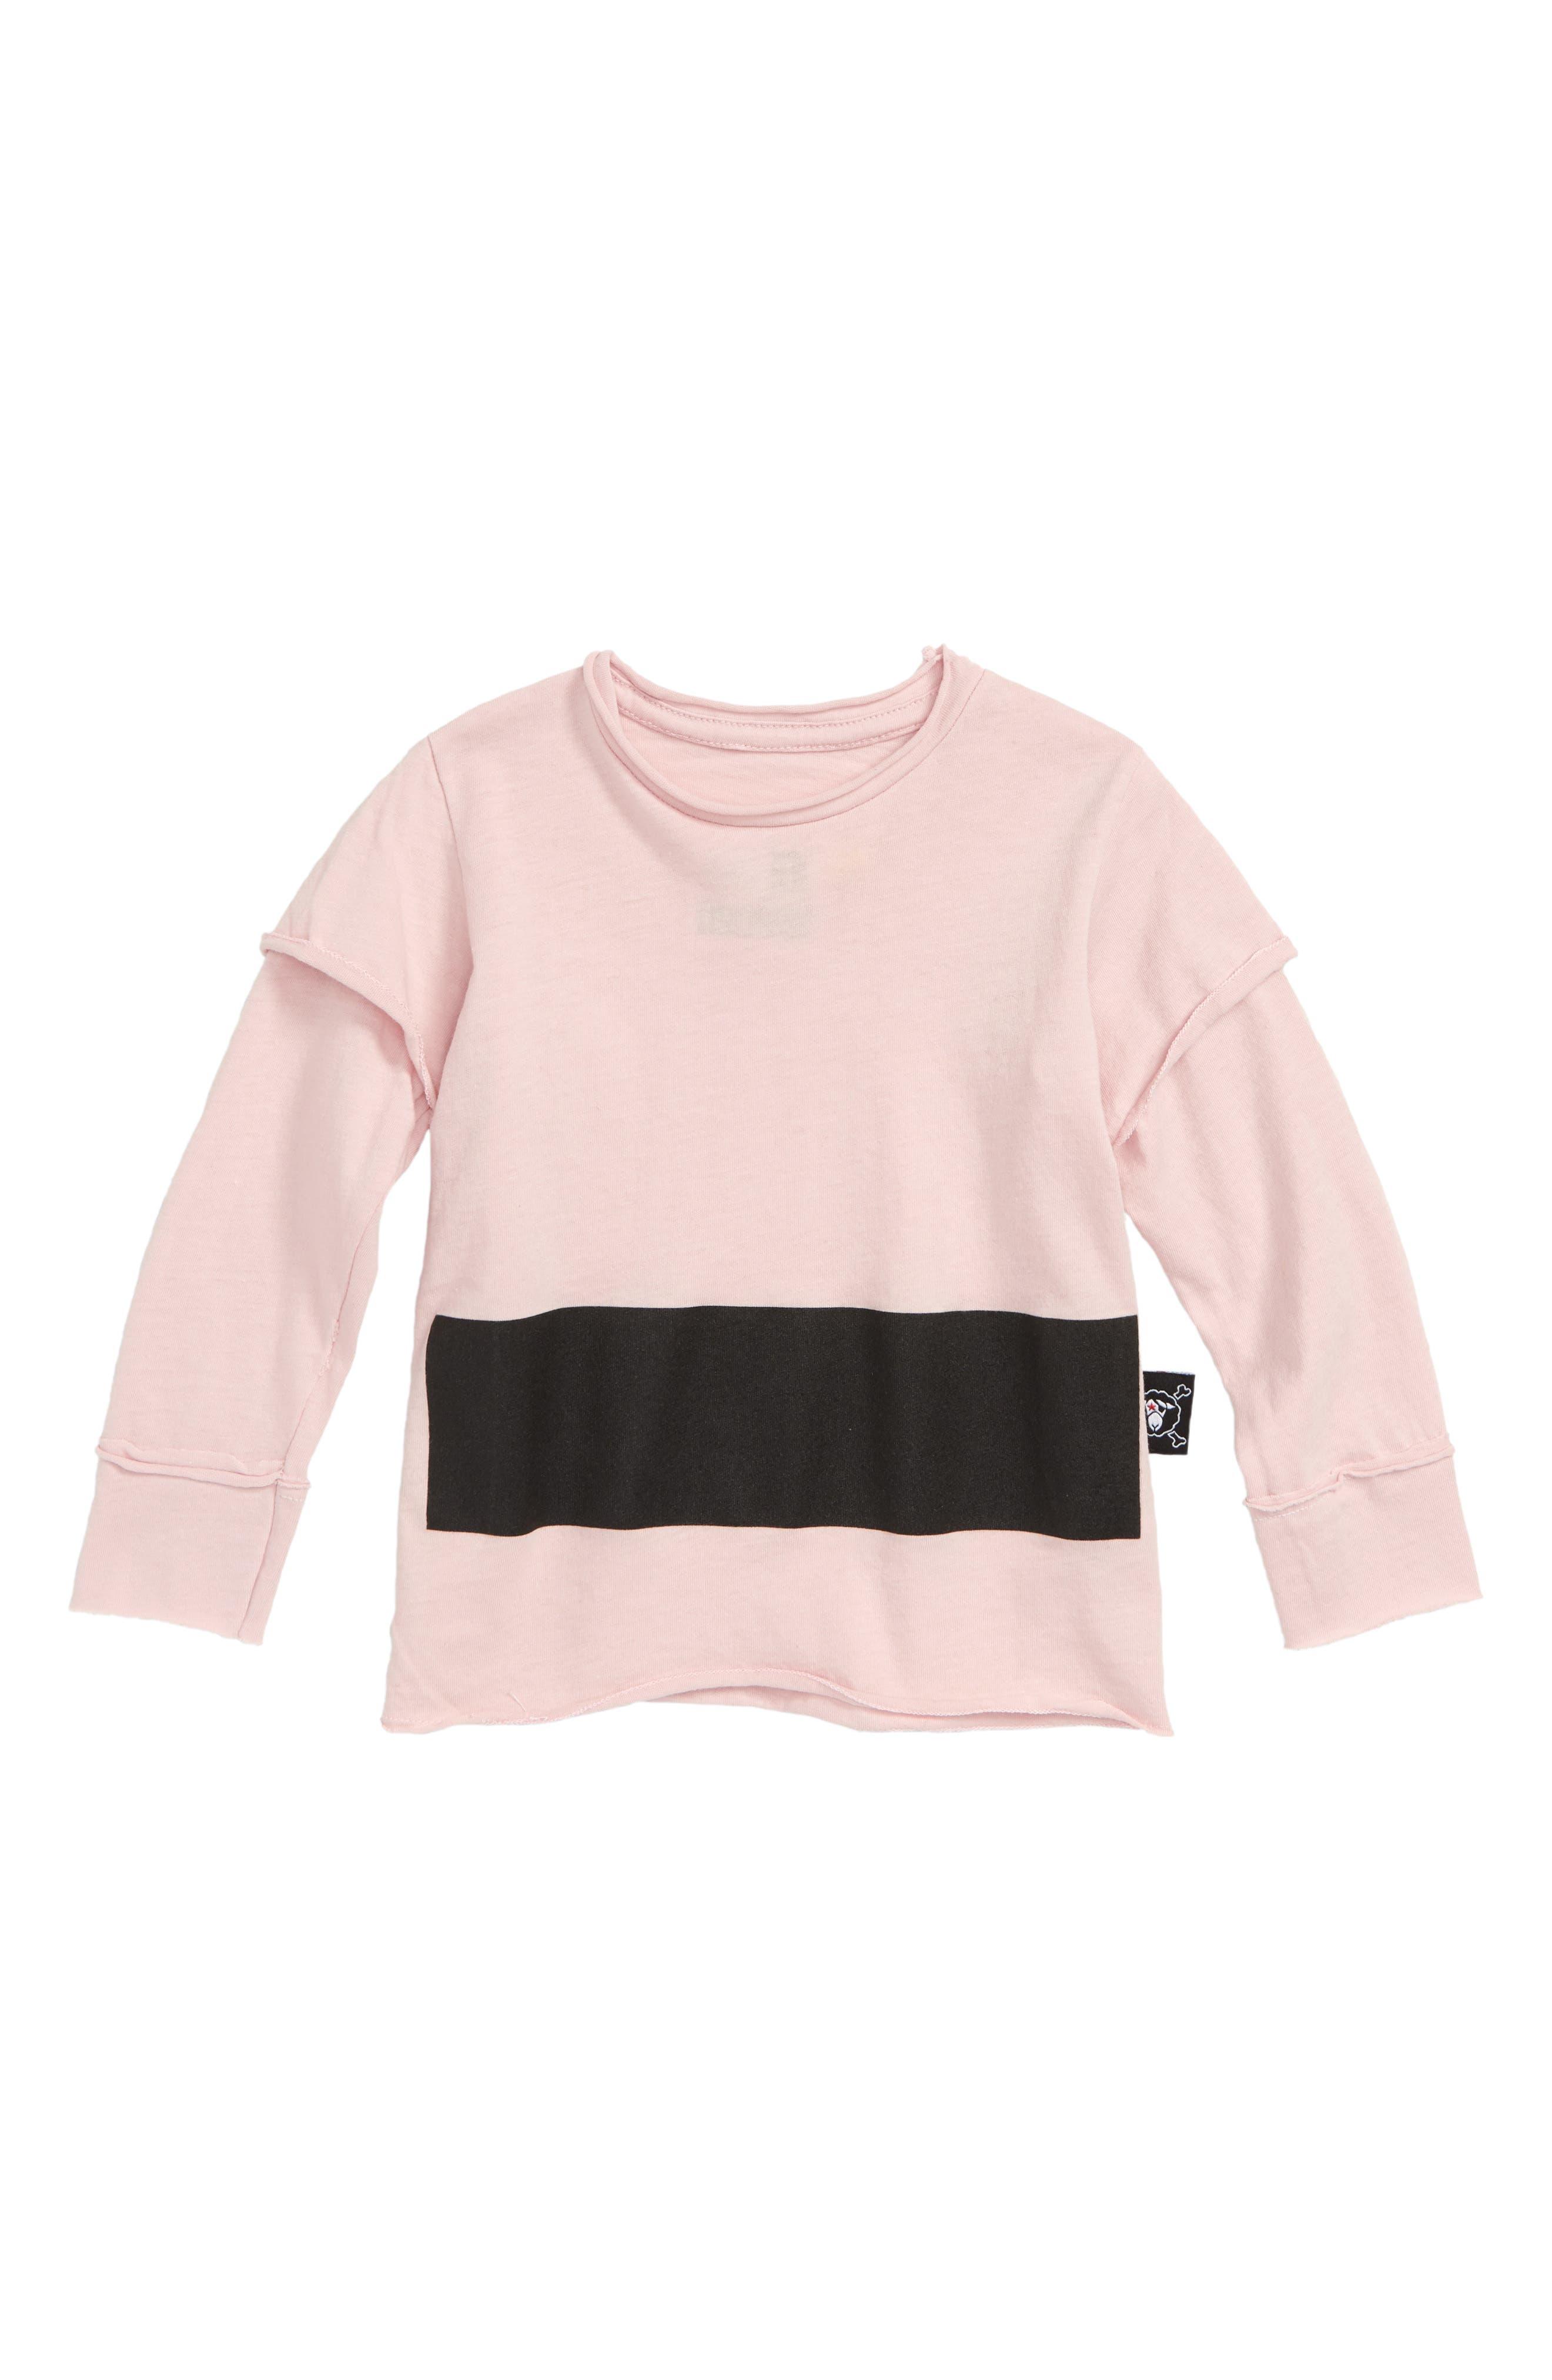 Stripe Tee,                         Main,                         color, 680